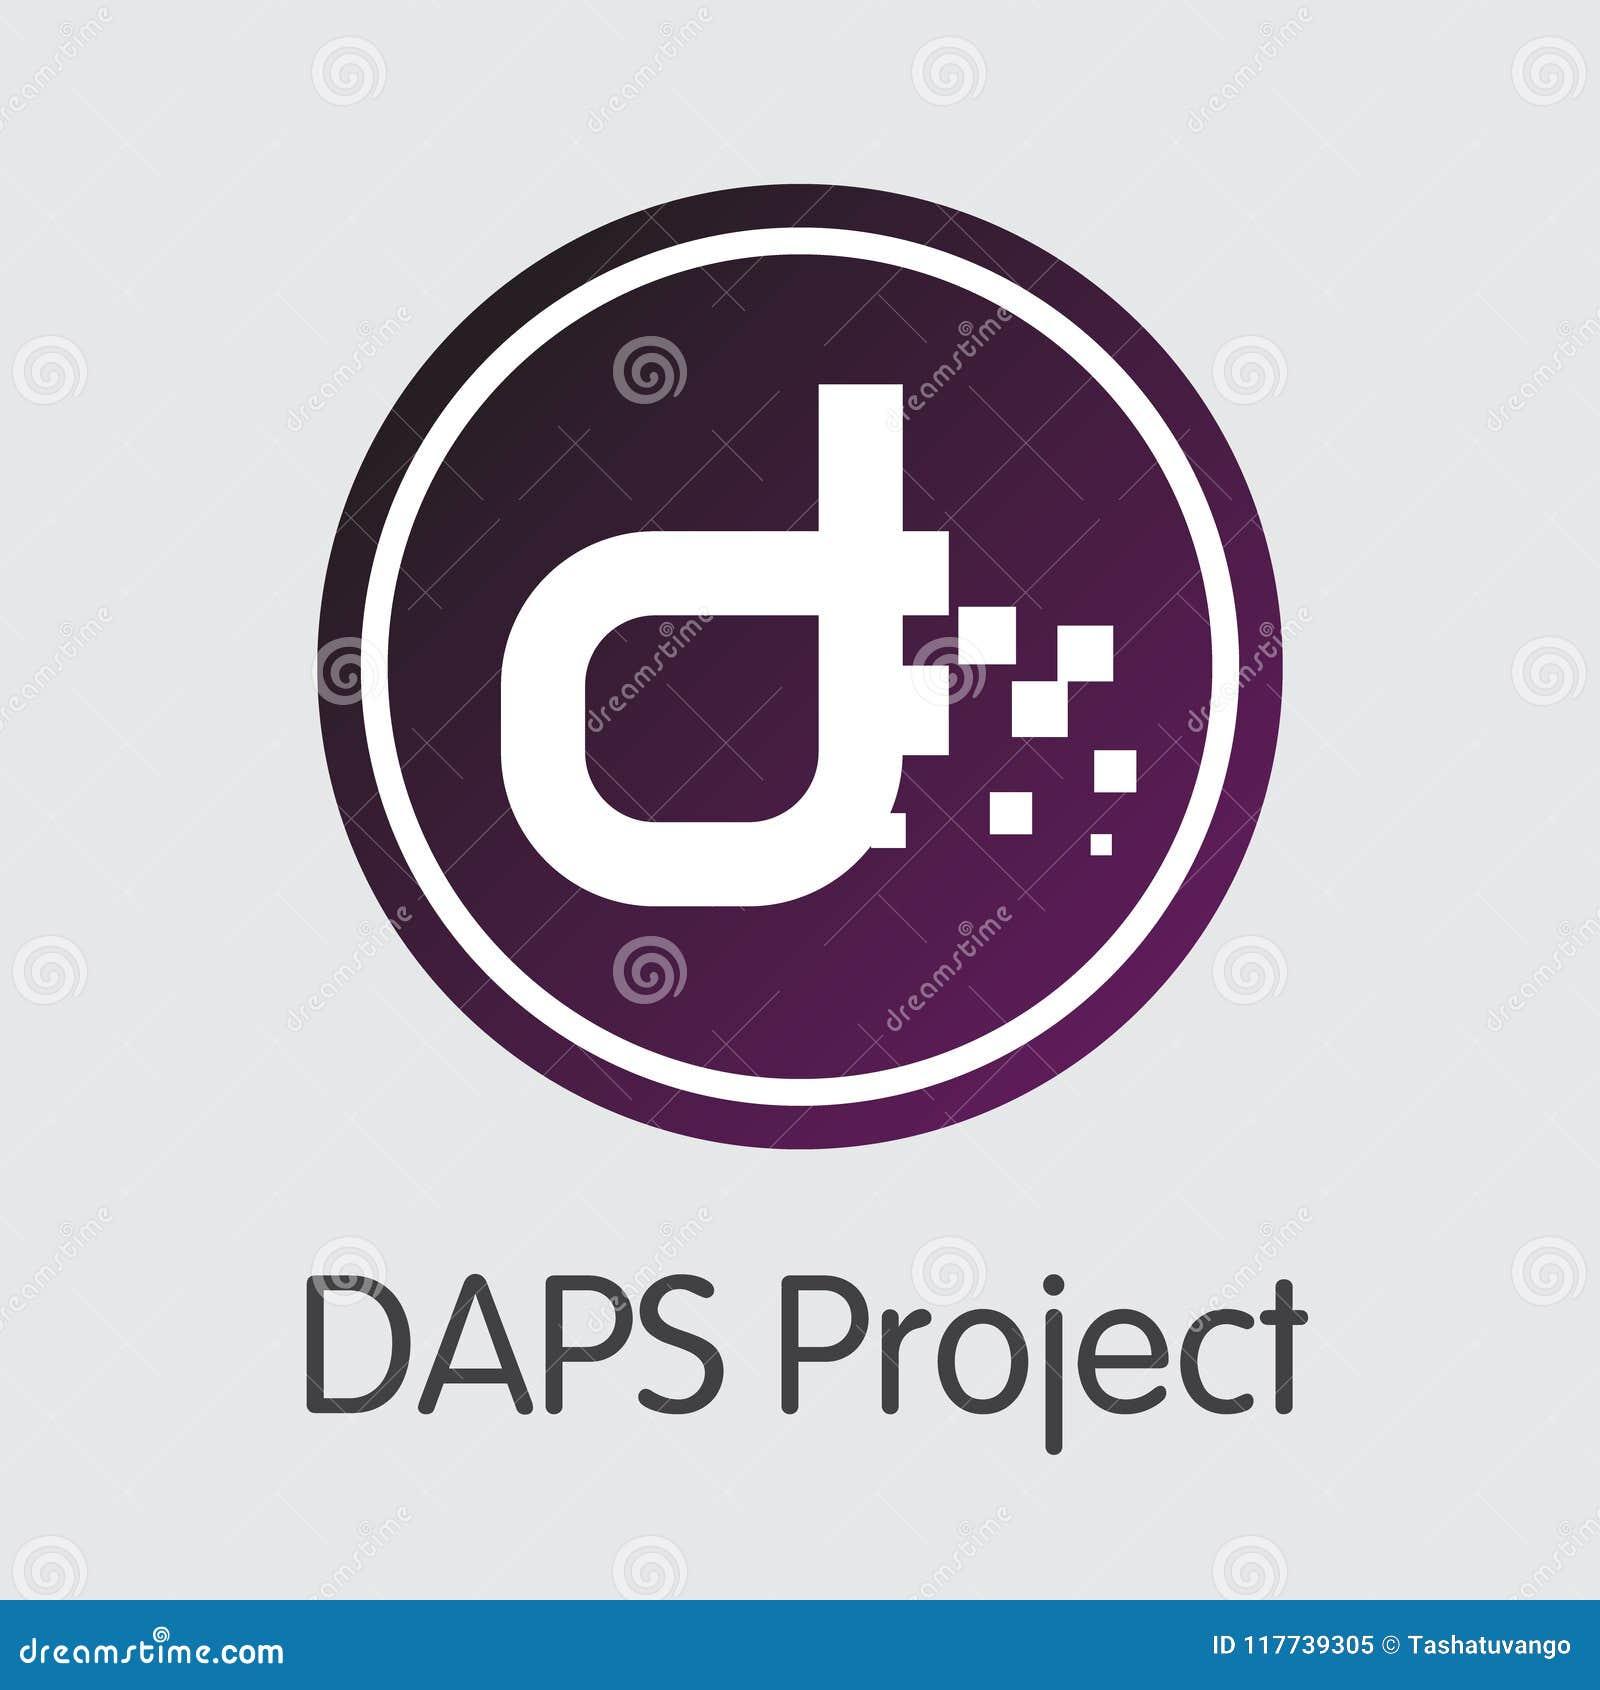 Daps - icono virtual de la muestra de moneda